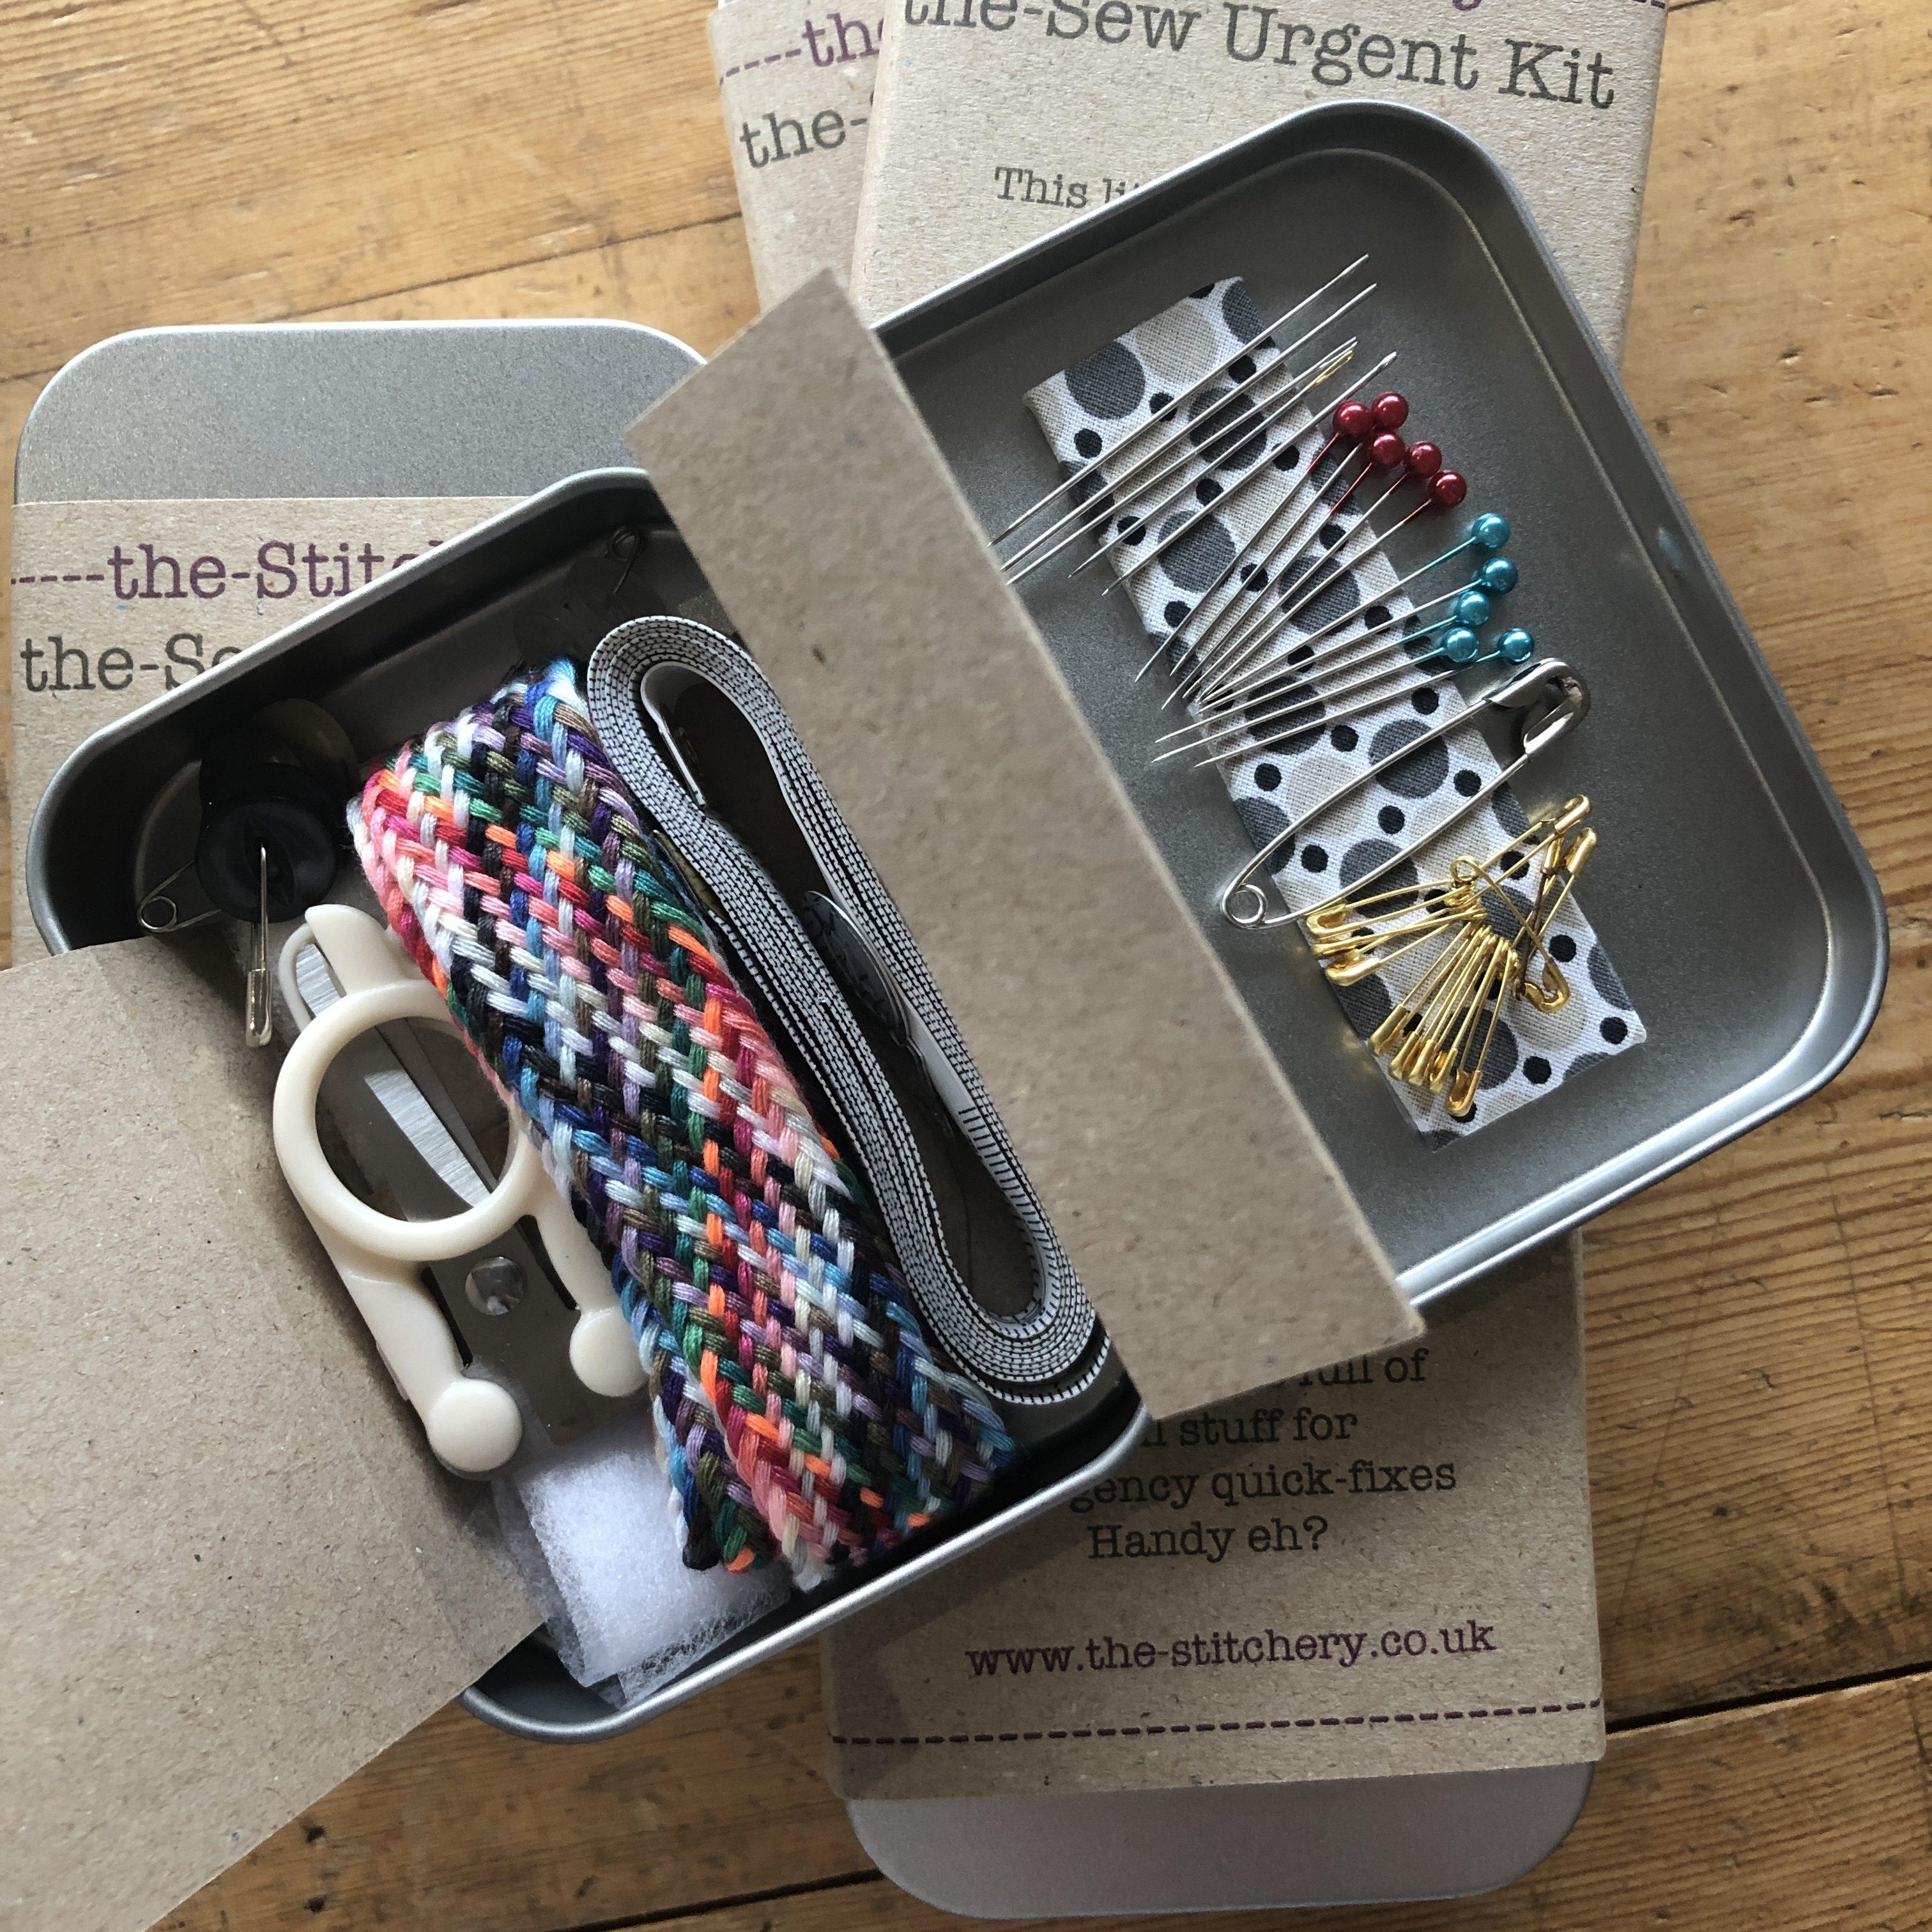 the-S brand : the-Sew Urgent Mending Kit